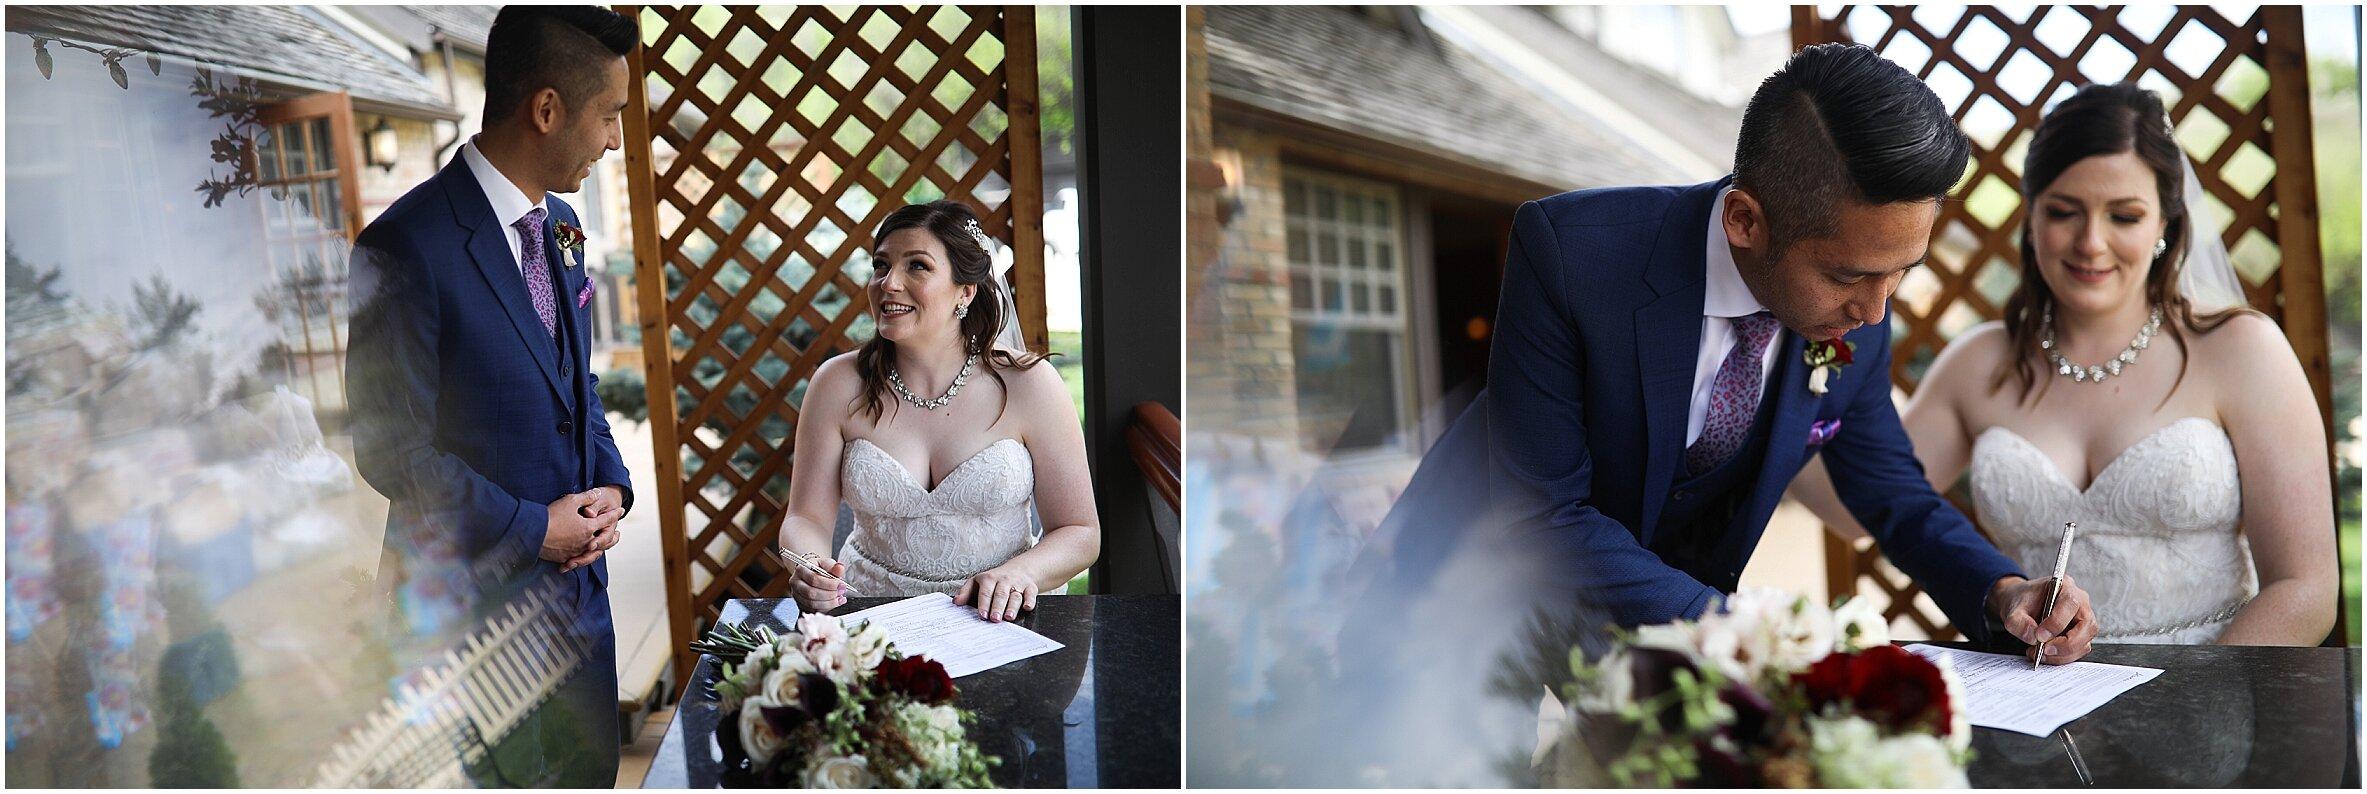 vancouver-wedding-photographer-the-loft-earls-yaletown_0108.jpg